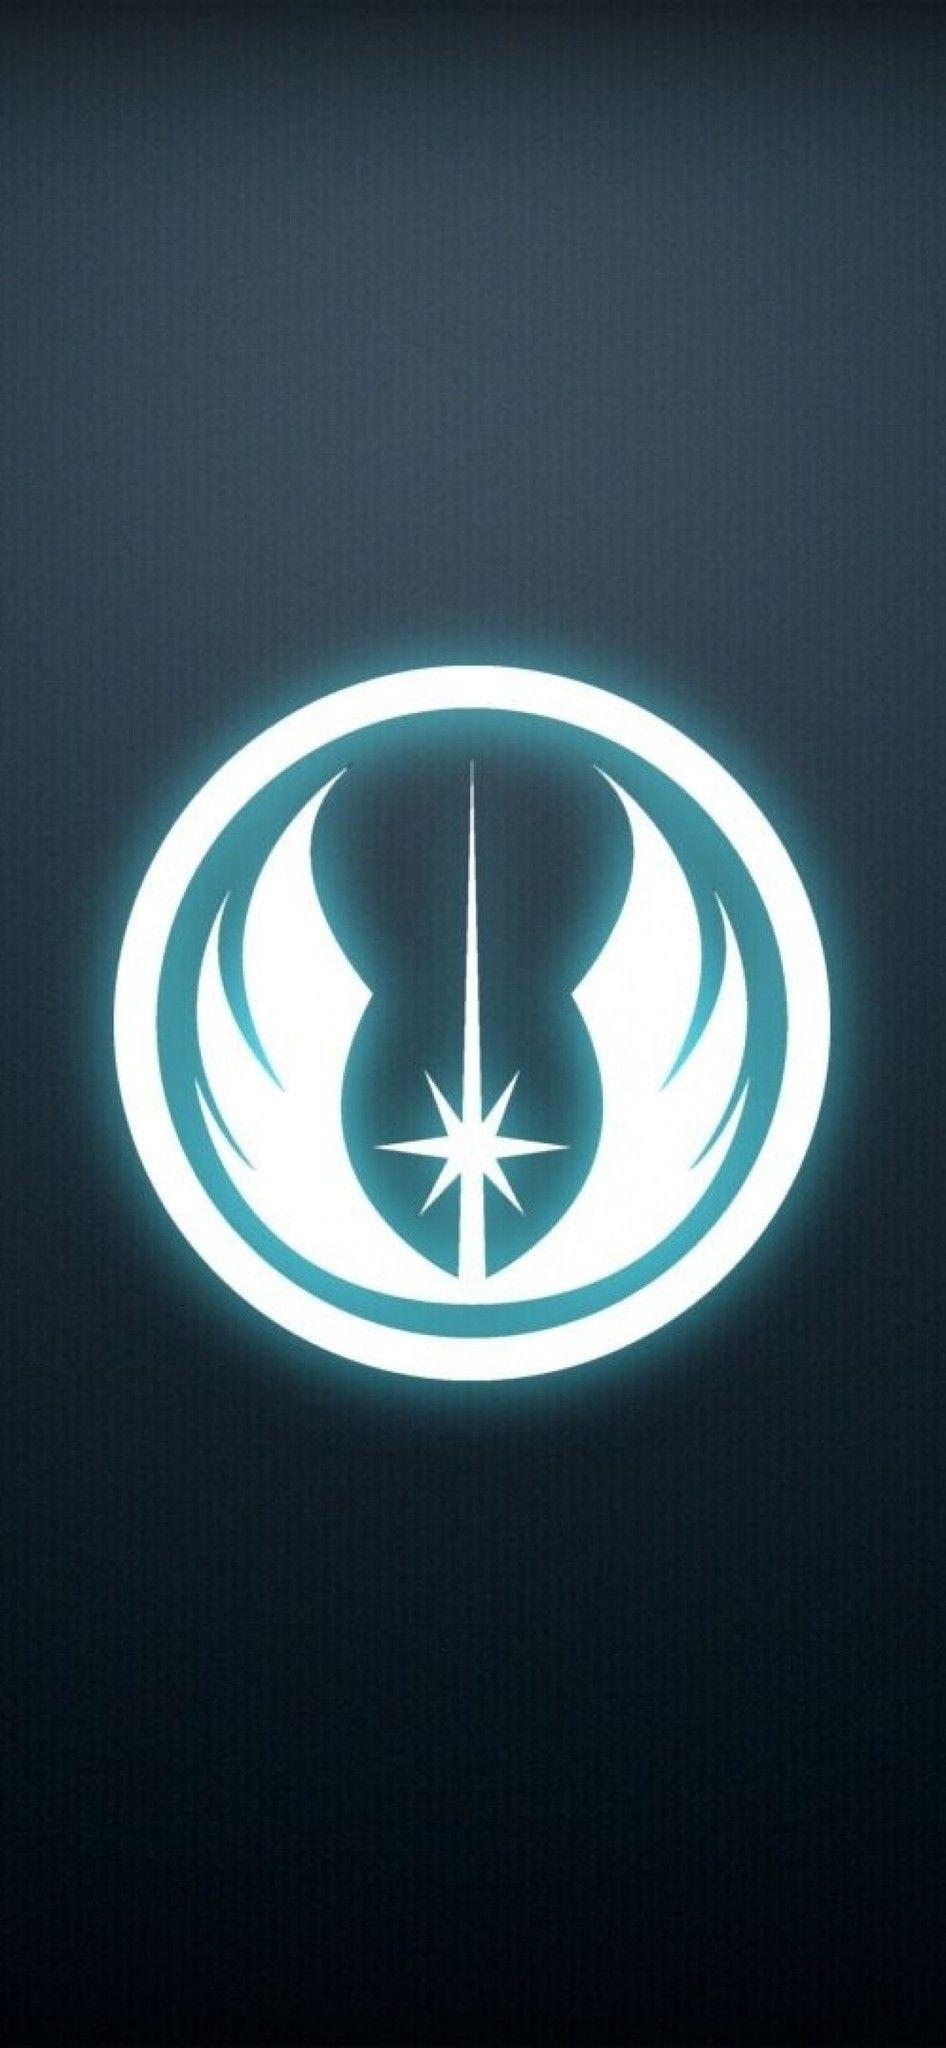 Pin By Thomas Falaschi On Star Wars Star Wars Wallpaper Star Wars Background Star Wars Symbols